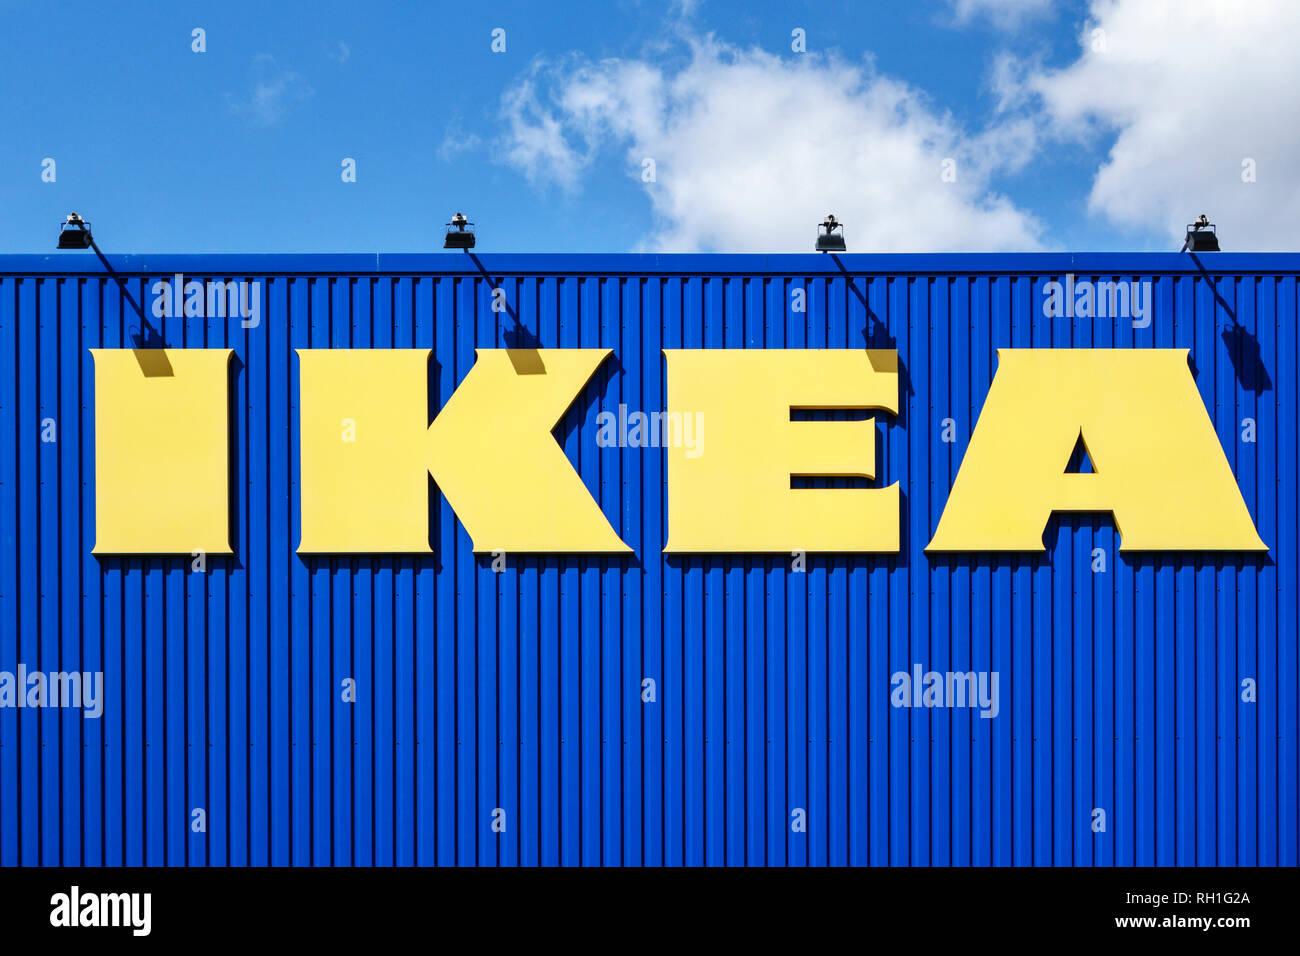 Ikea Logo Stock Photos Ikea Logo Stock Images Alamy